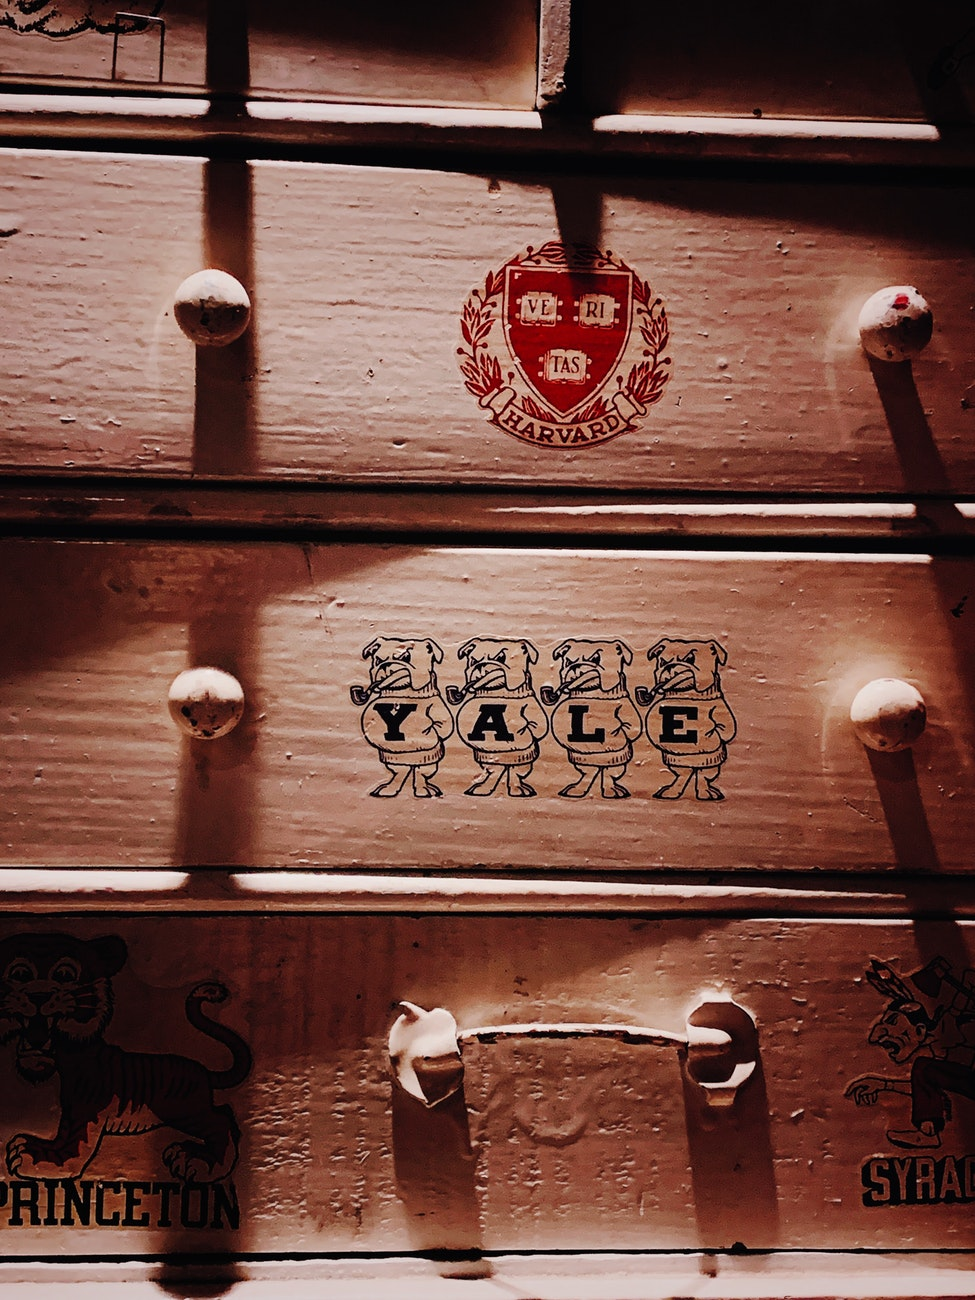 Yale-Harvard